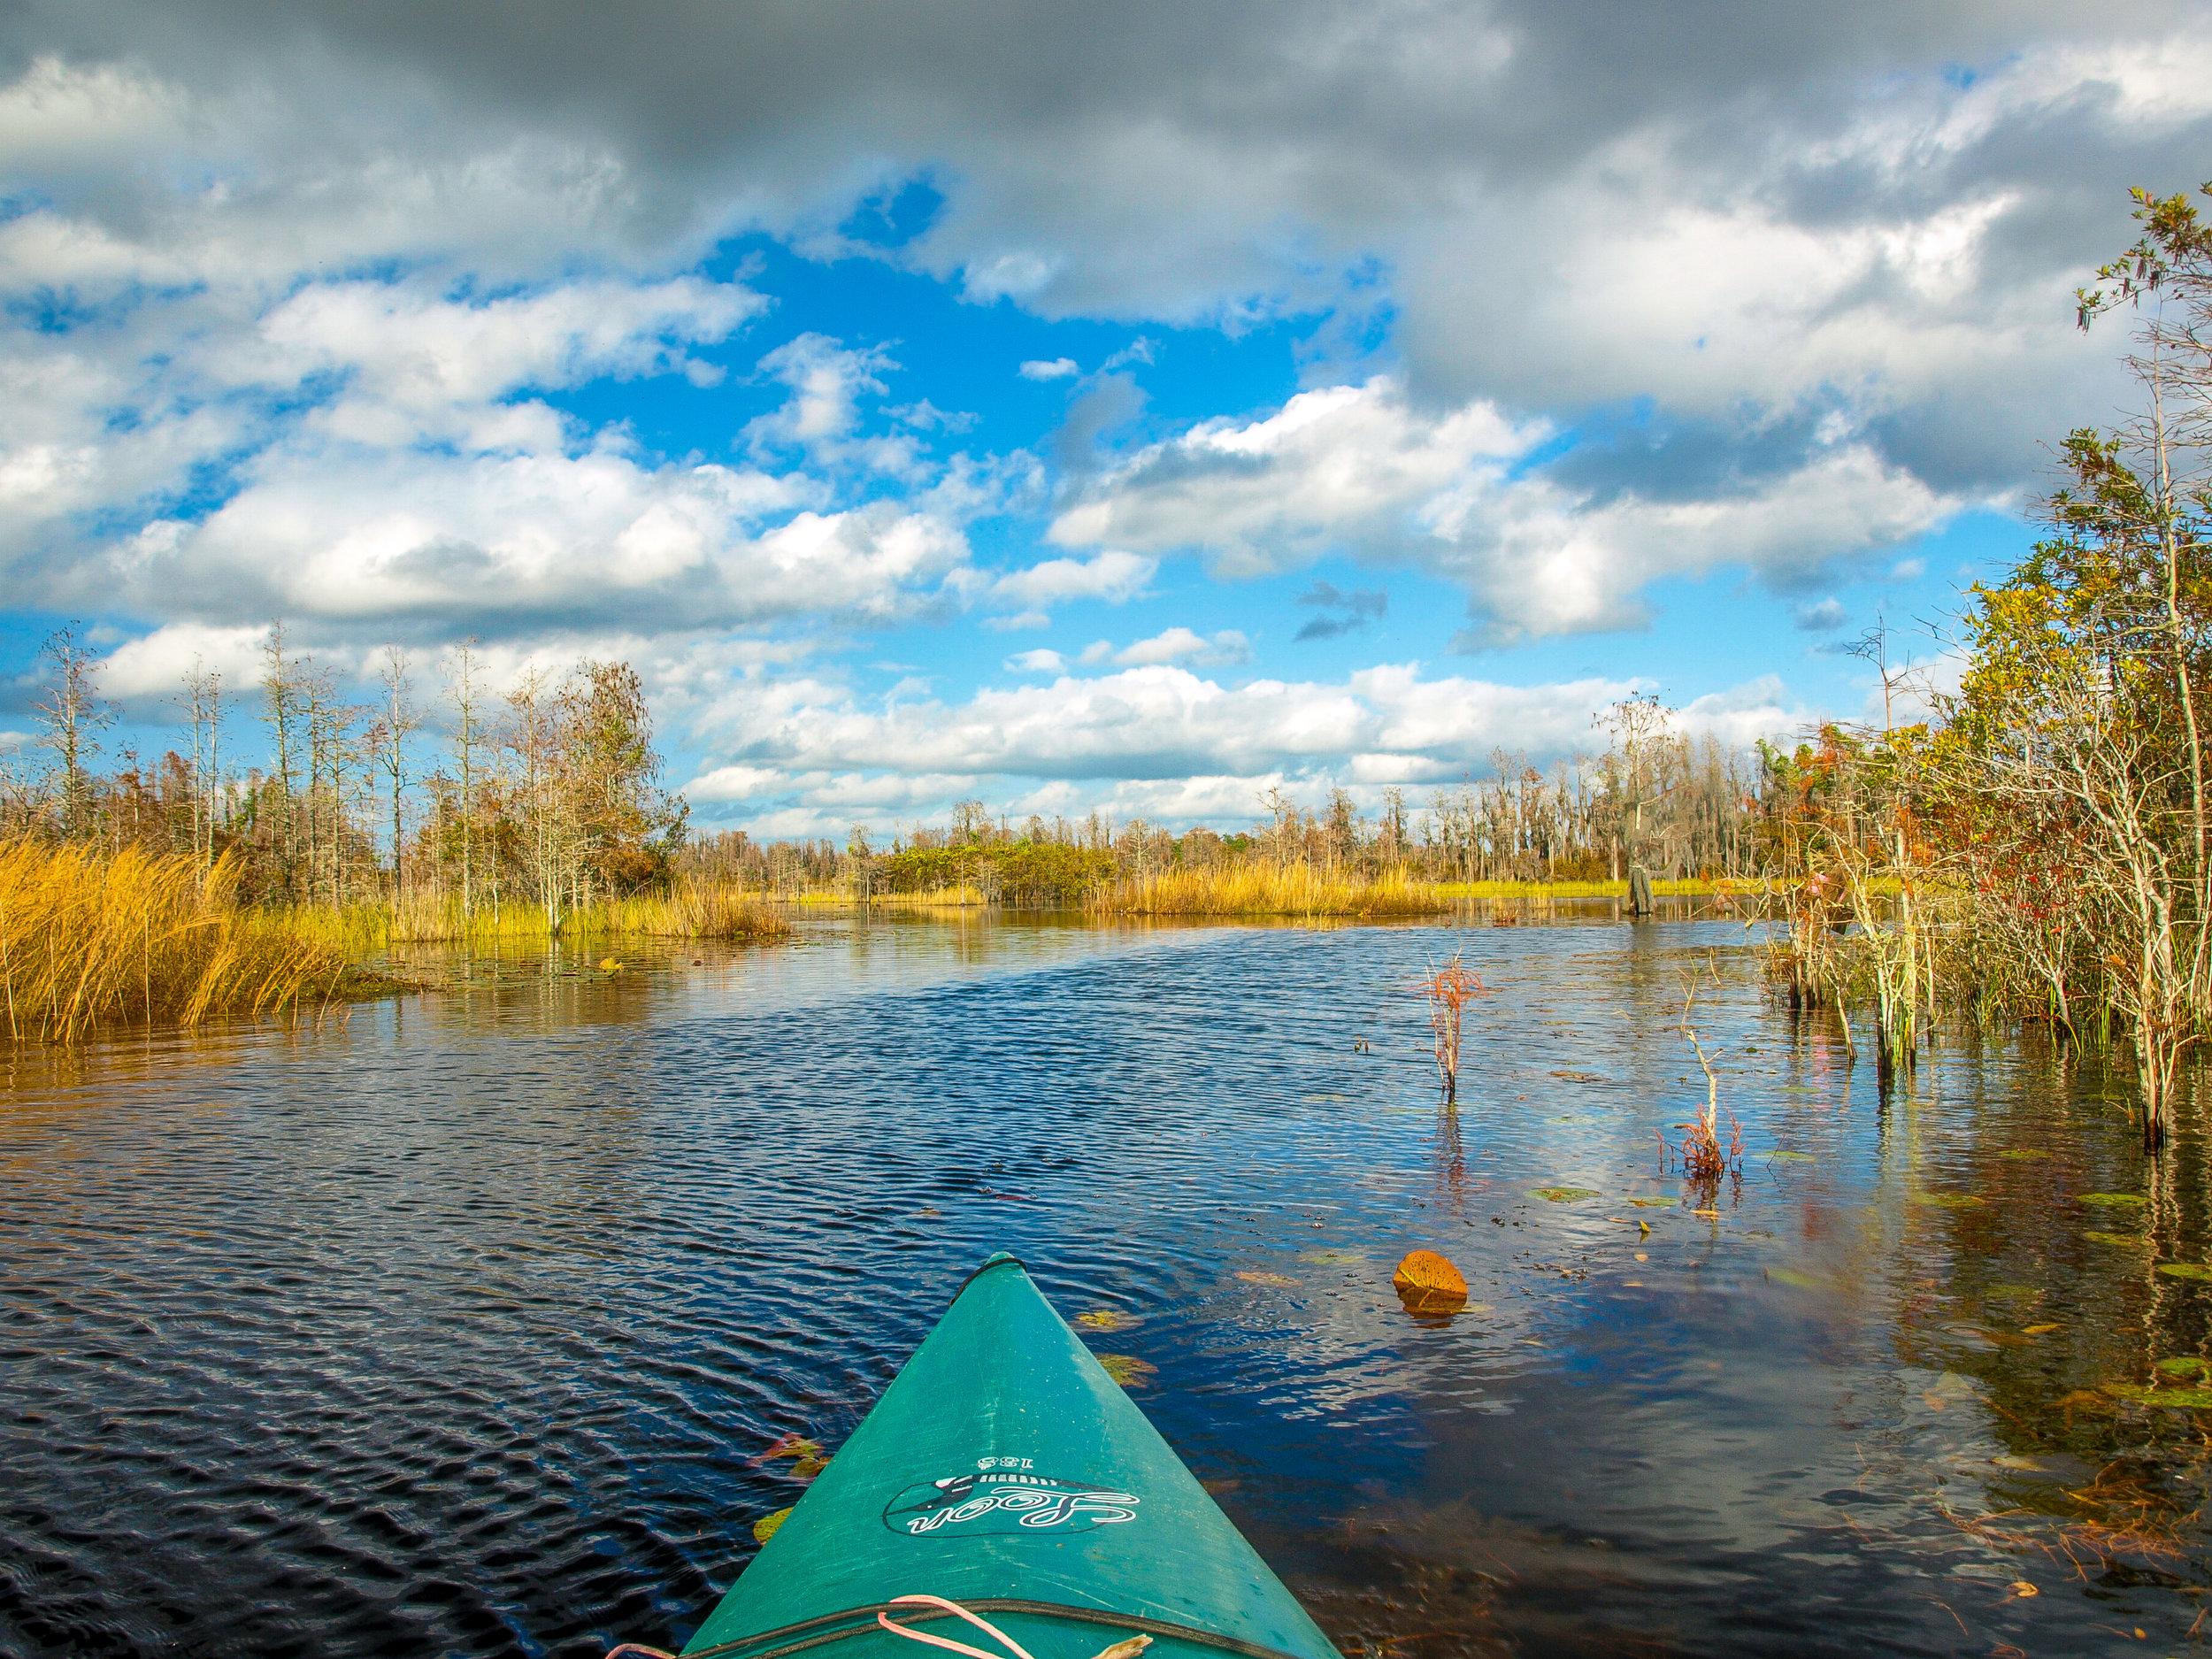 Kayaking in the Okefenokee Swamp